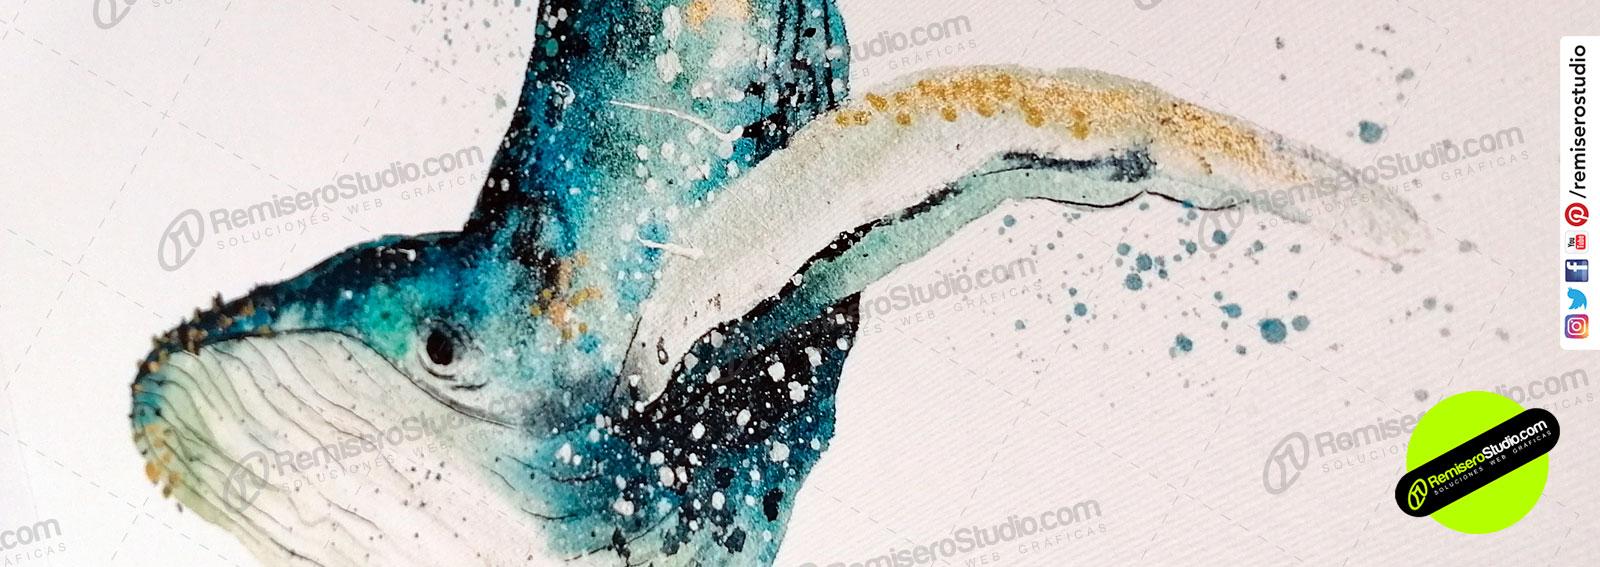 Impresión sobre cartulinas artisticas fineart Hahnemühle